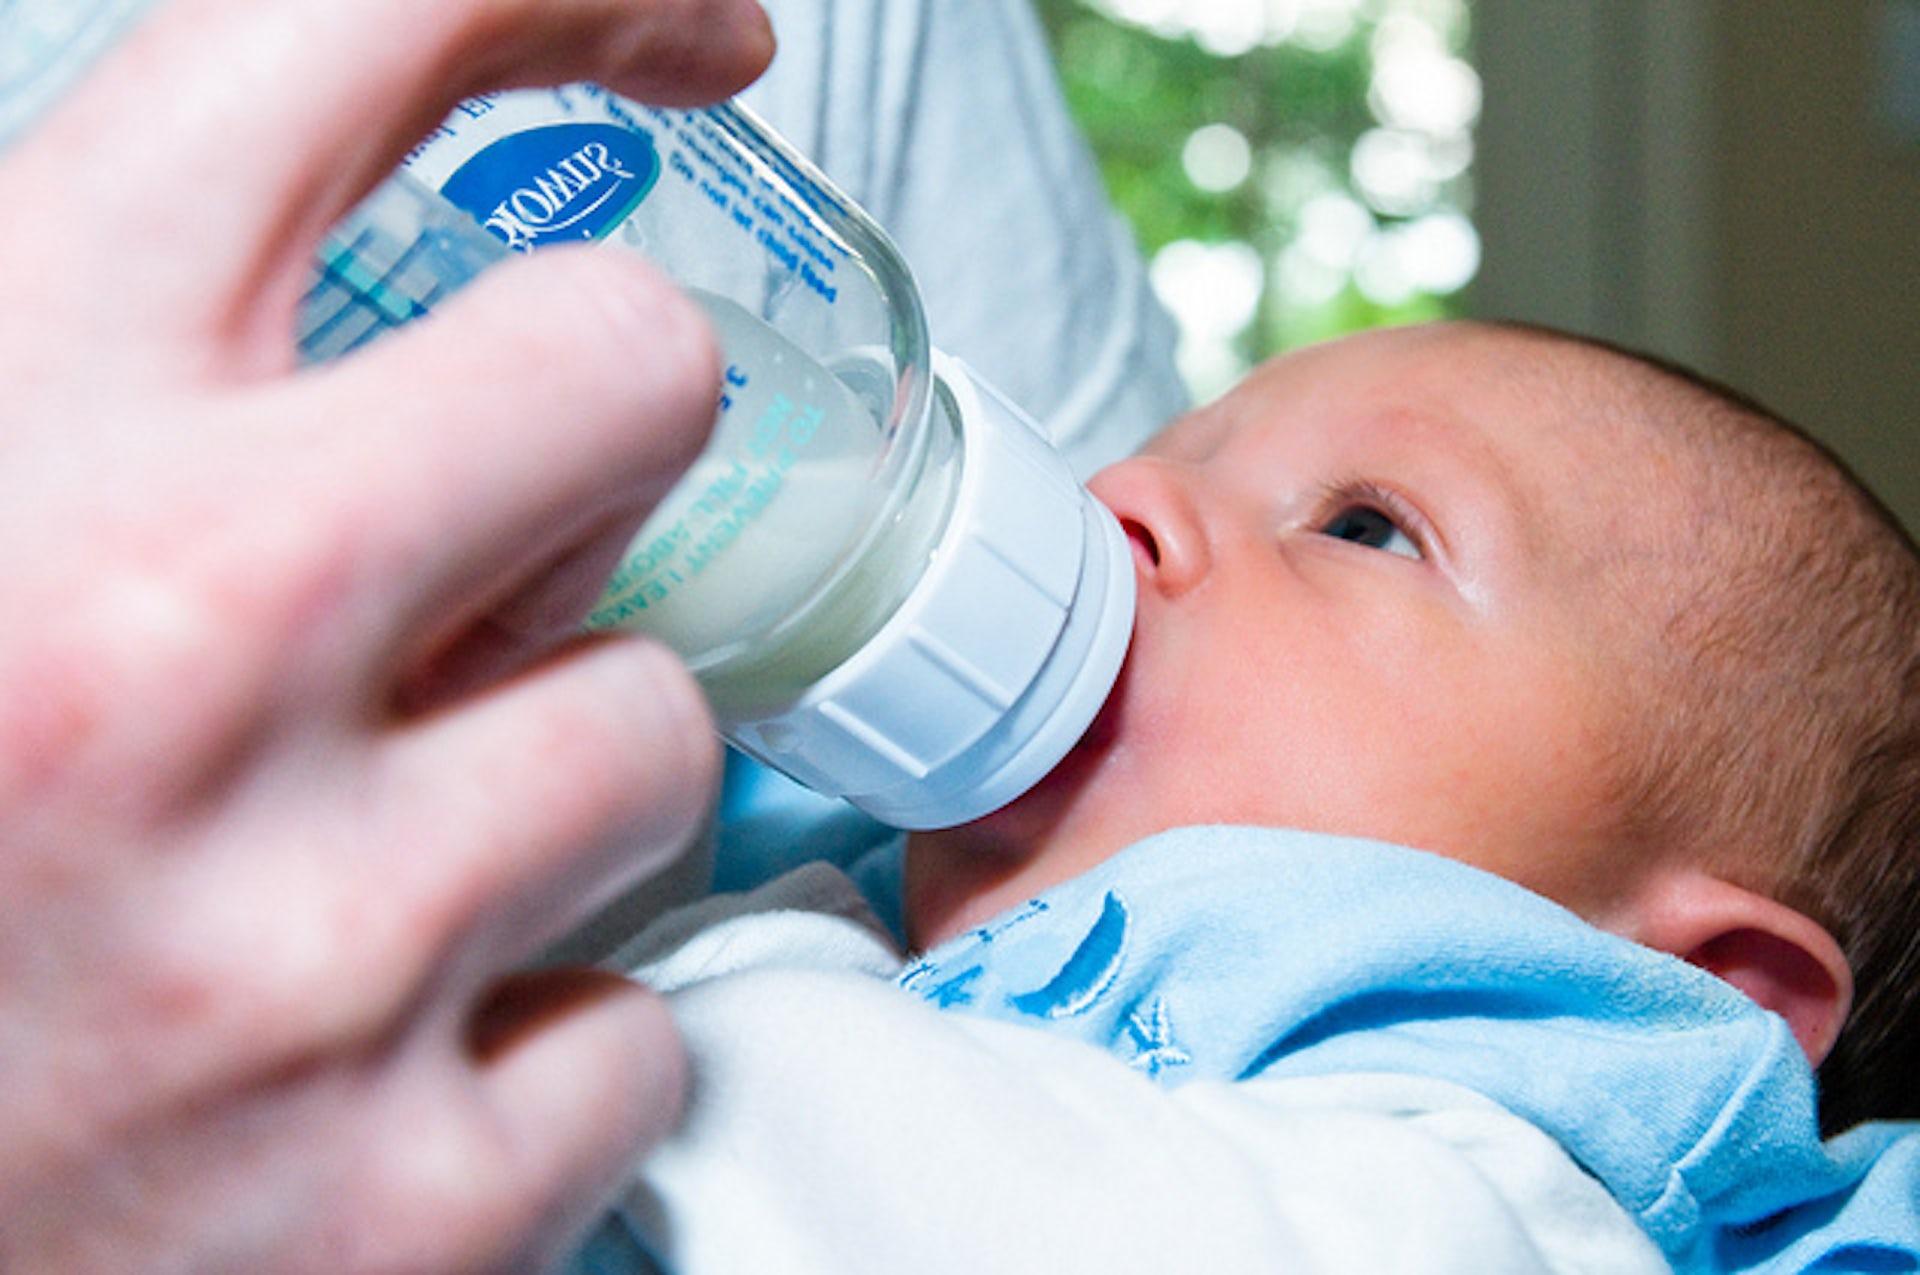 Best formula milk for newborn babies in south africa